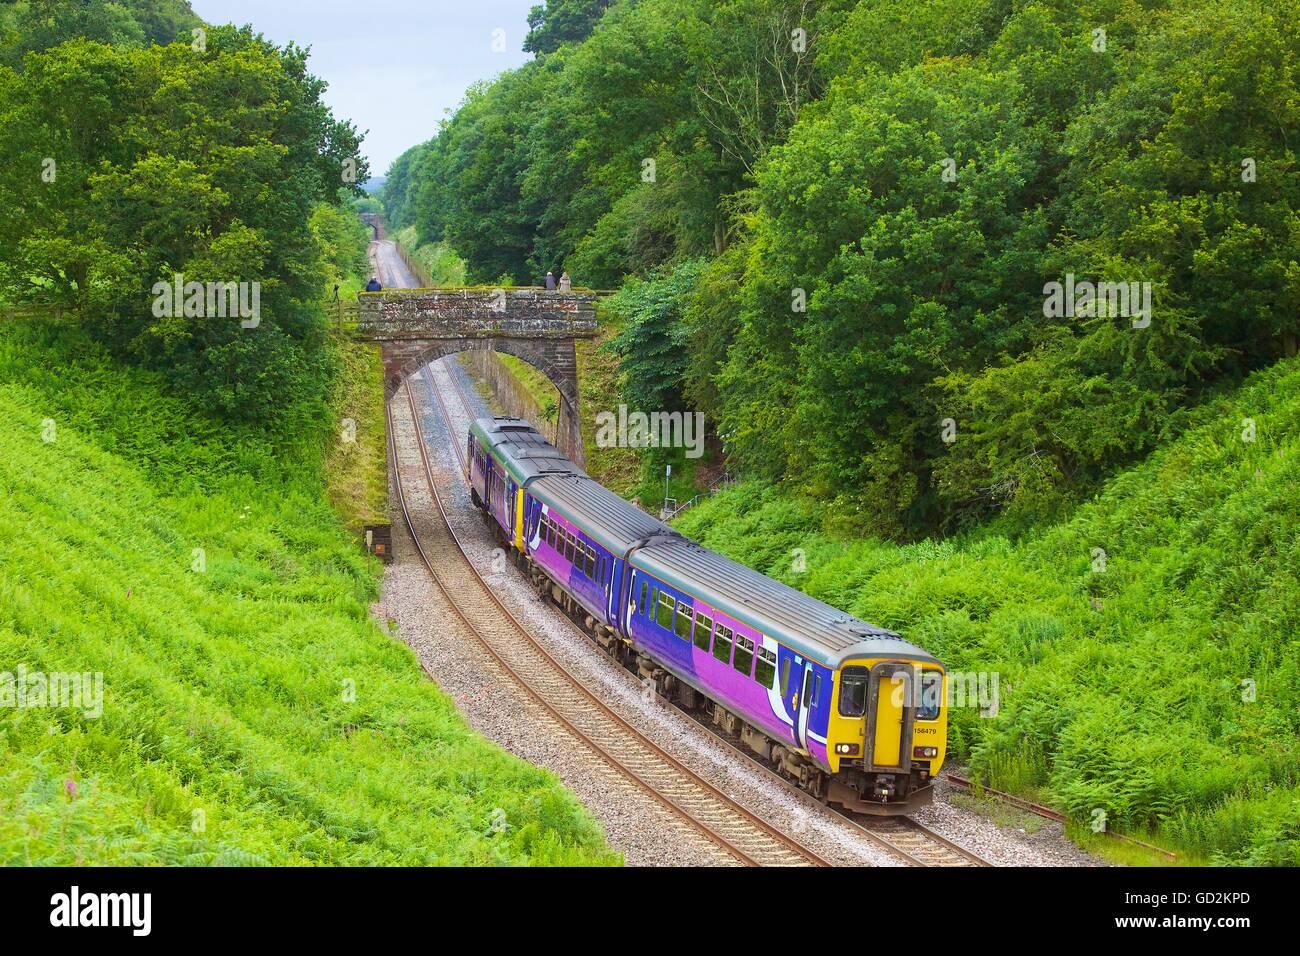 Cowran Cut. Sprinter train. Cowran Cutting, Brampton, Cumbria, England, United Kingdom, Europe. - Stock Image